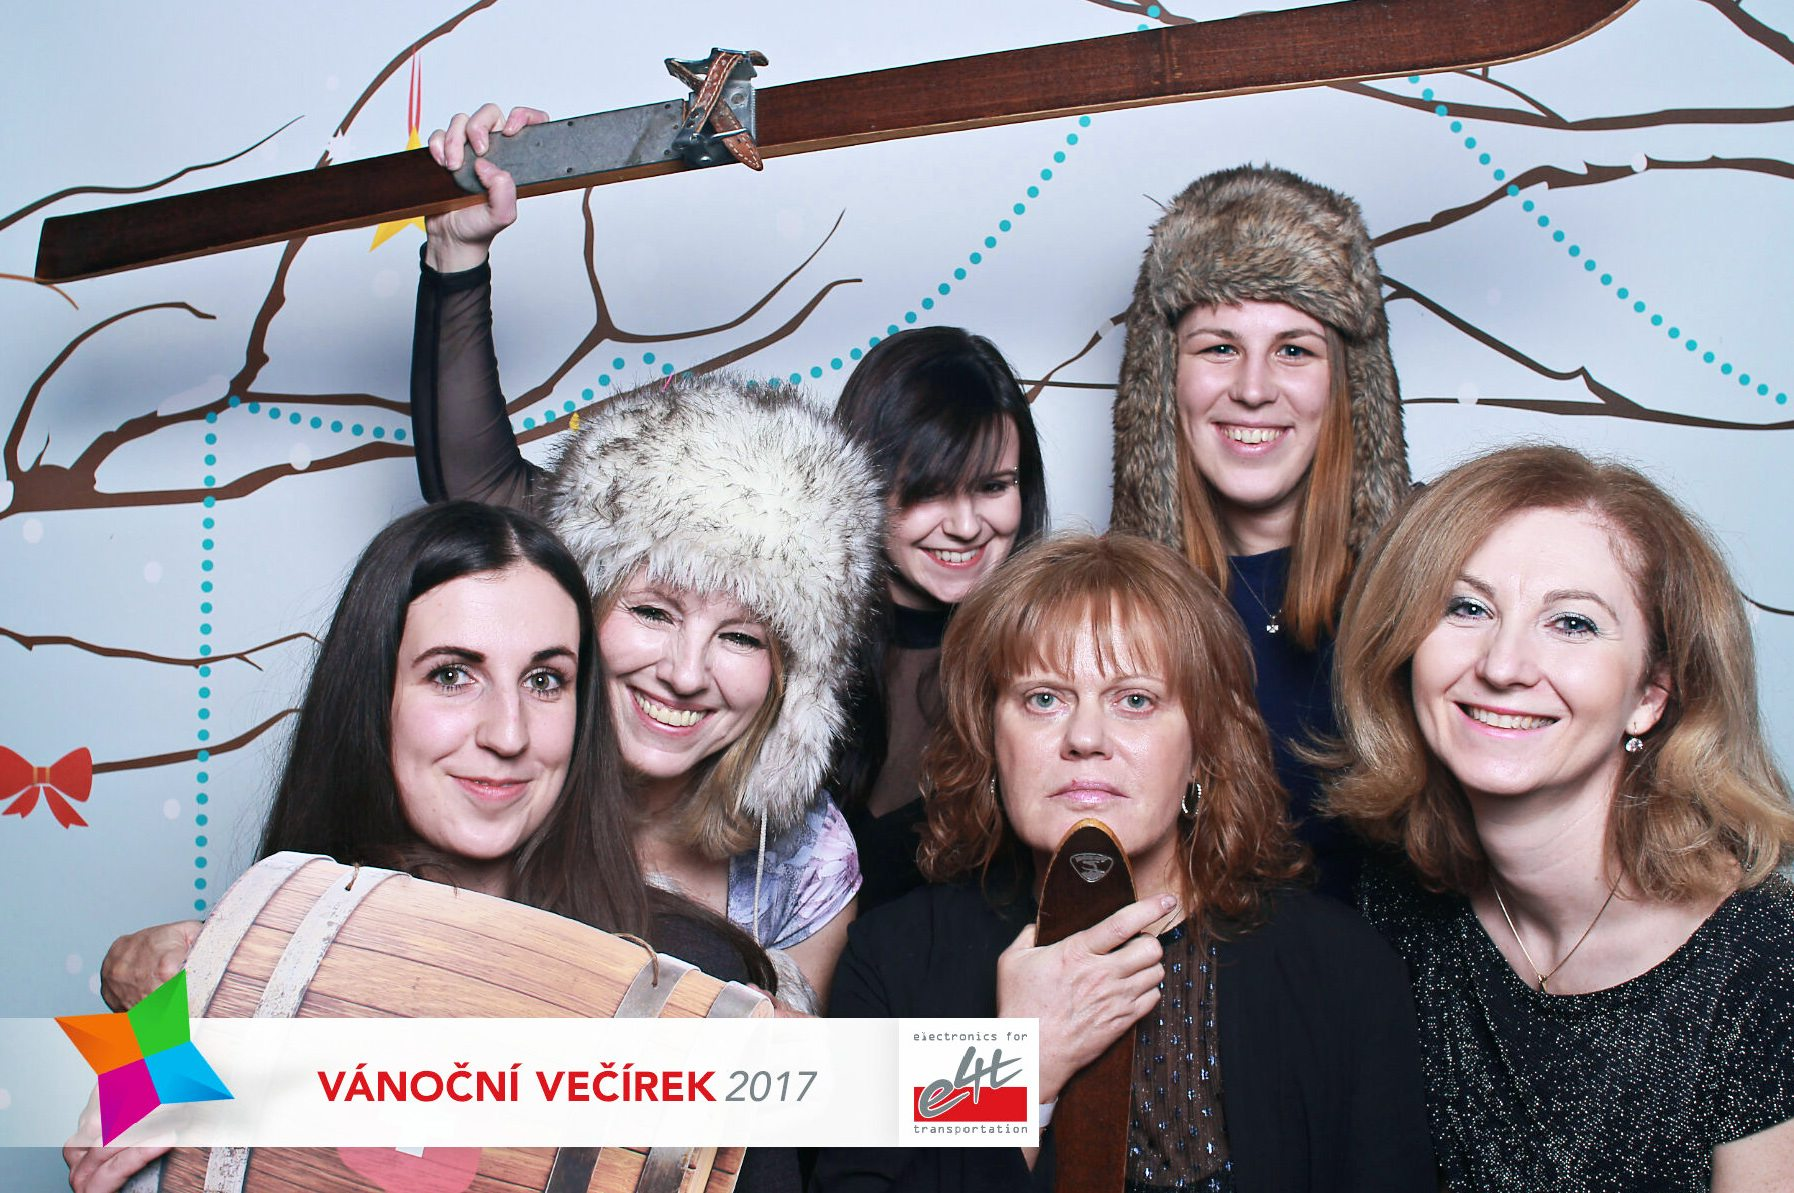 fotokoutek-e4t-vanocni-vecirek-15-12-2017-368898